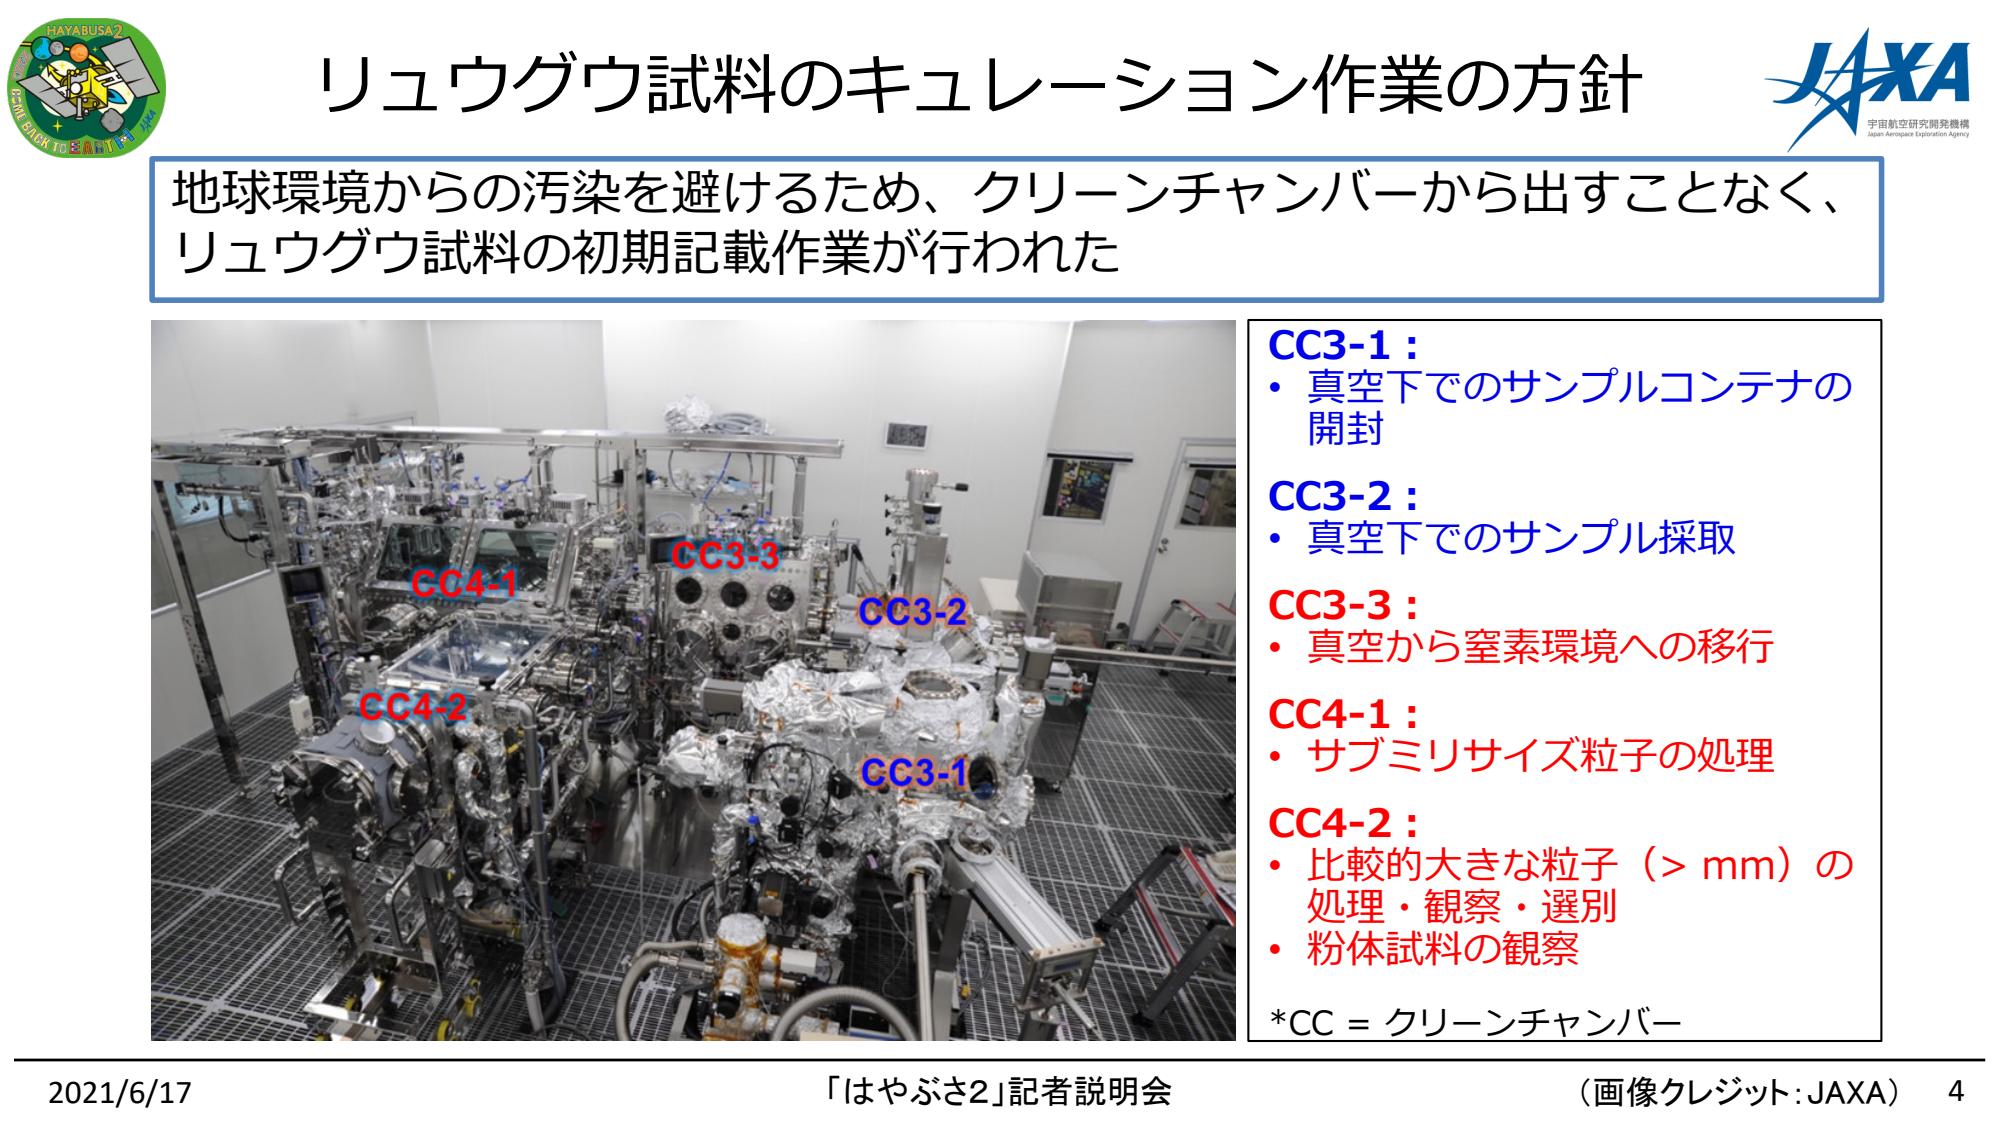 f:id:Imamura:20210617130118p:plain